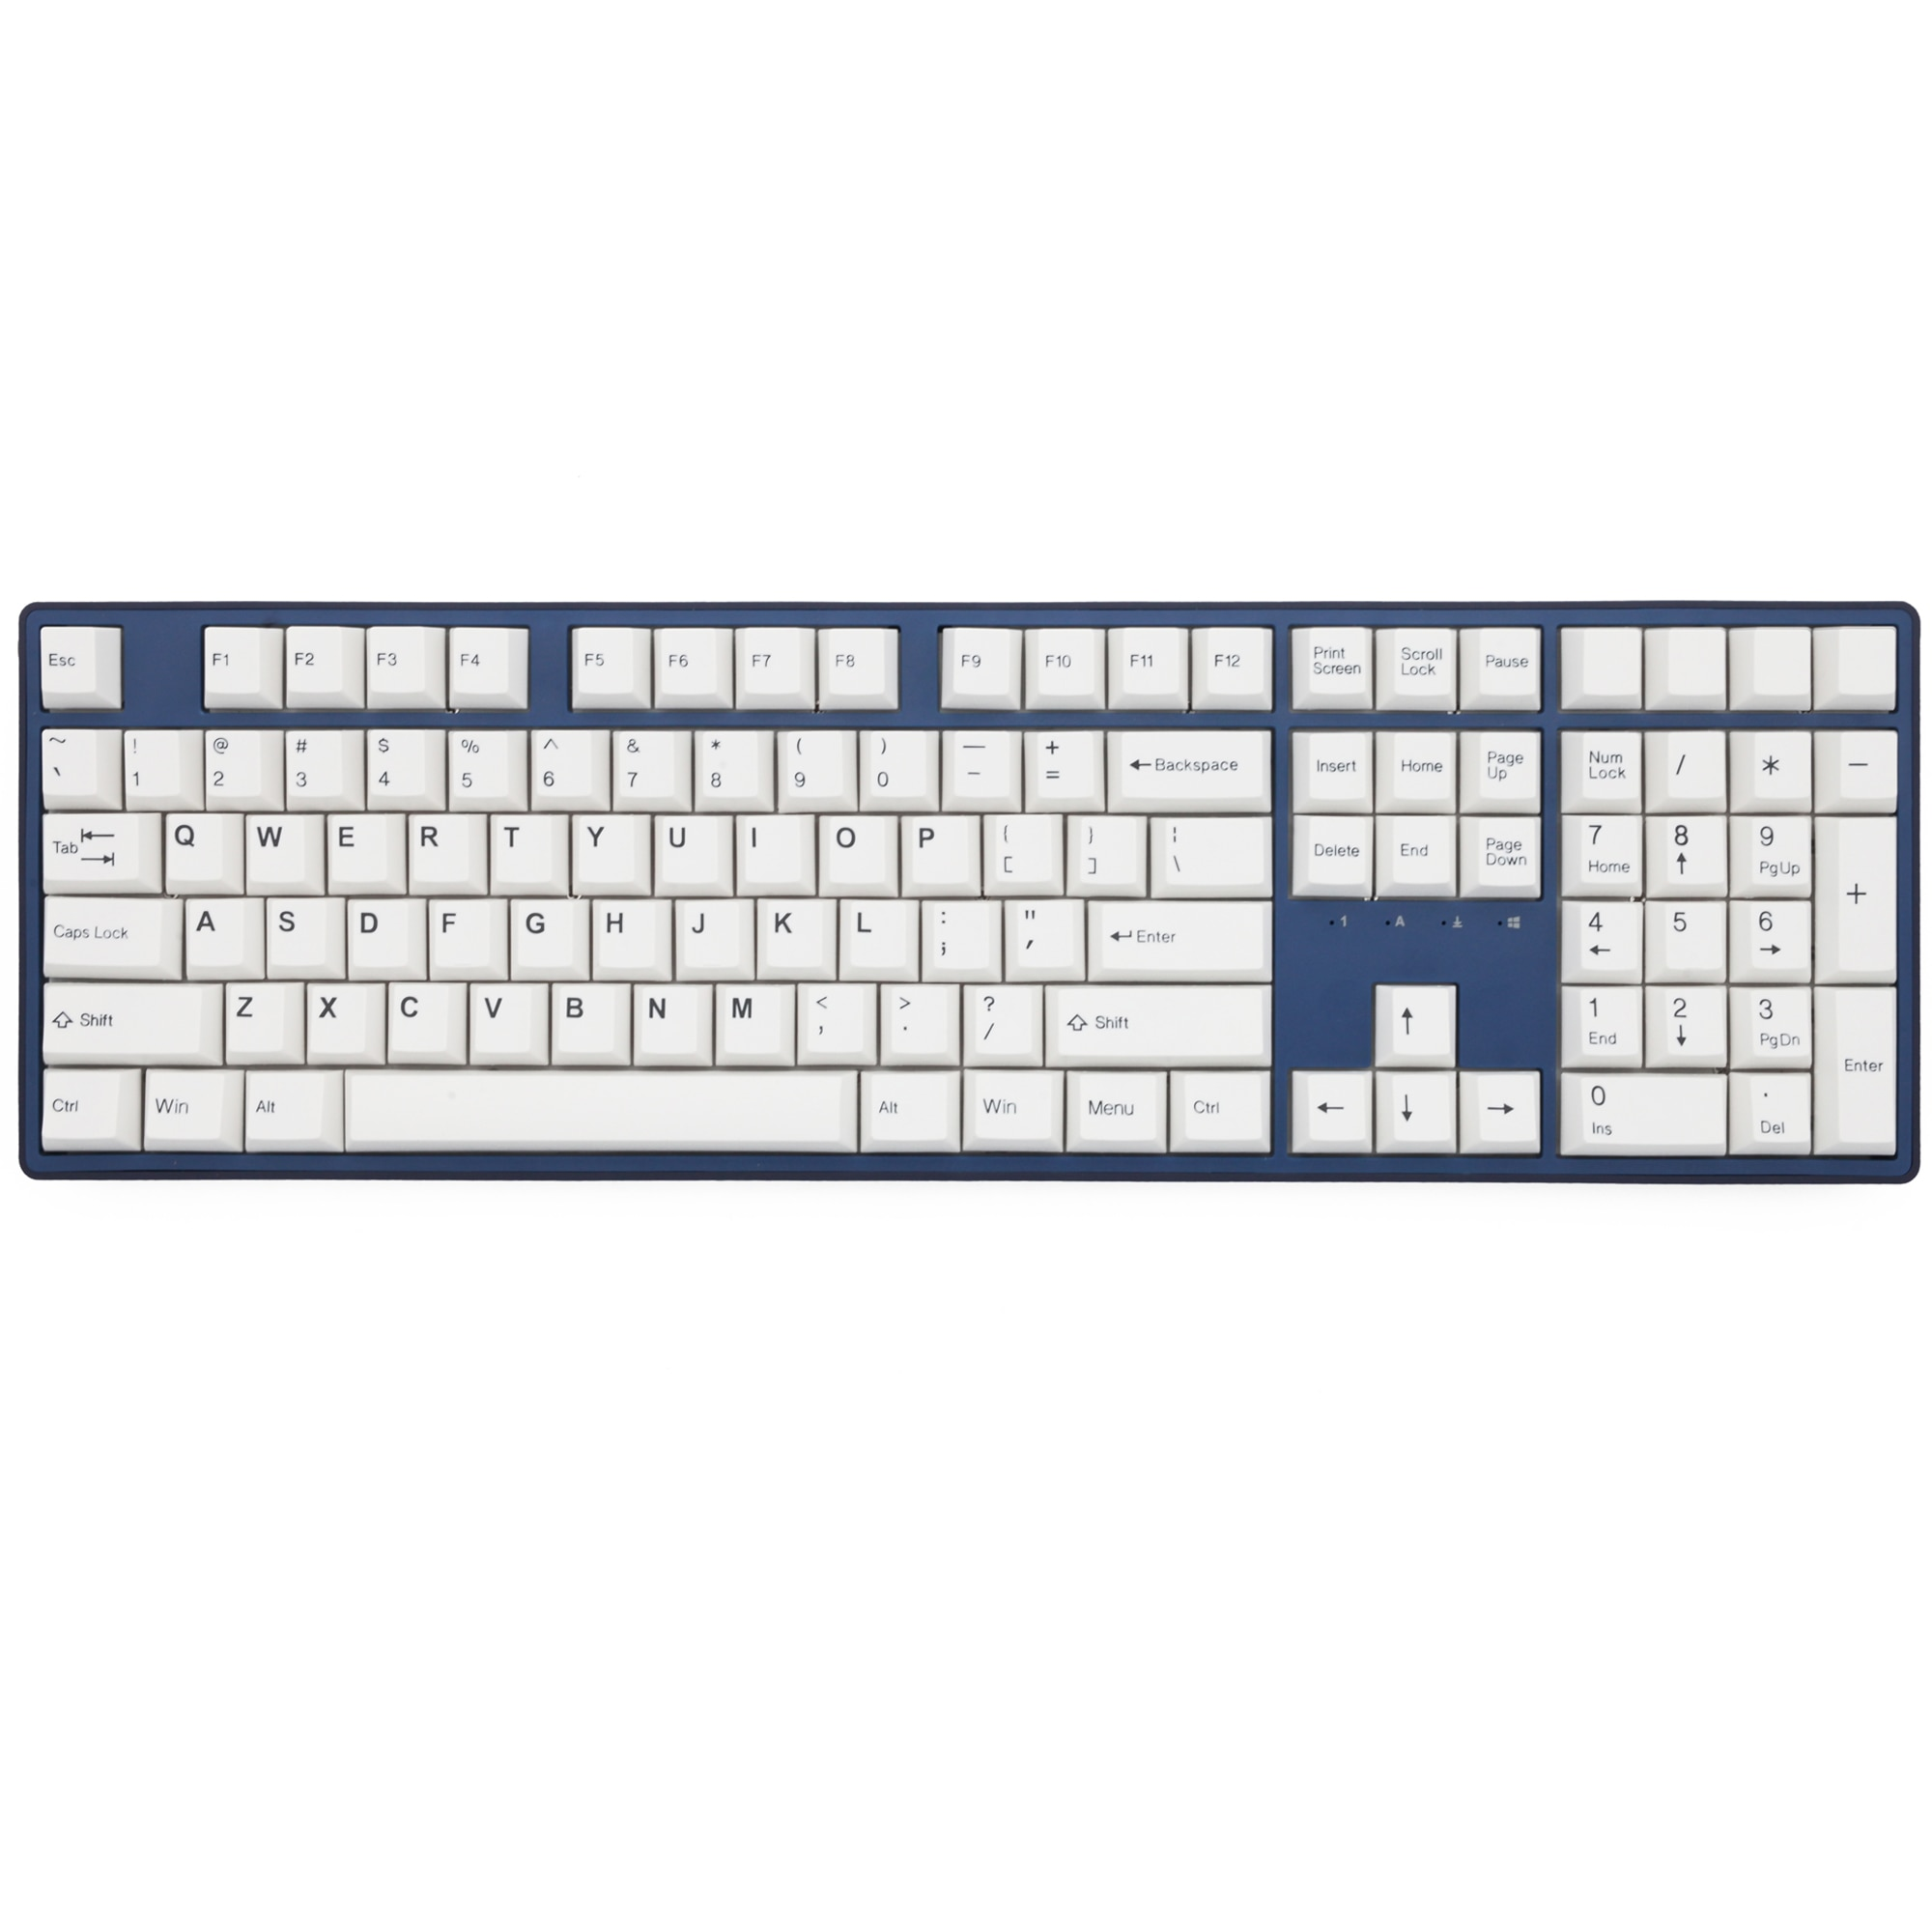 Taihao القوس الأسود على الأبيض abs doubleshot مكعب keycap لتقوم بها بنفسك لوحة مفاتيح الألعاب الميكانيكية ل xd64 bm60 xd68 bm68 xd84 gh60 xd96